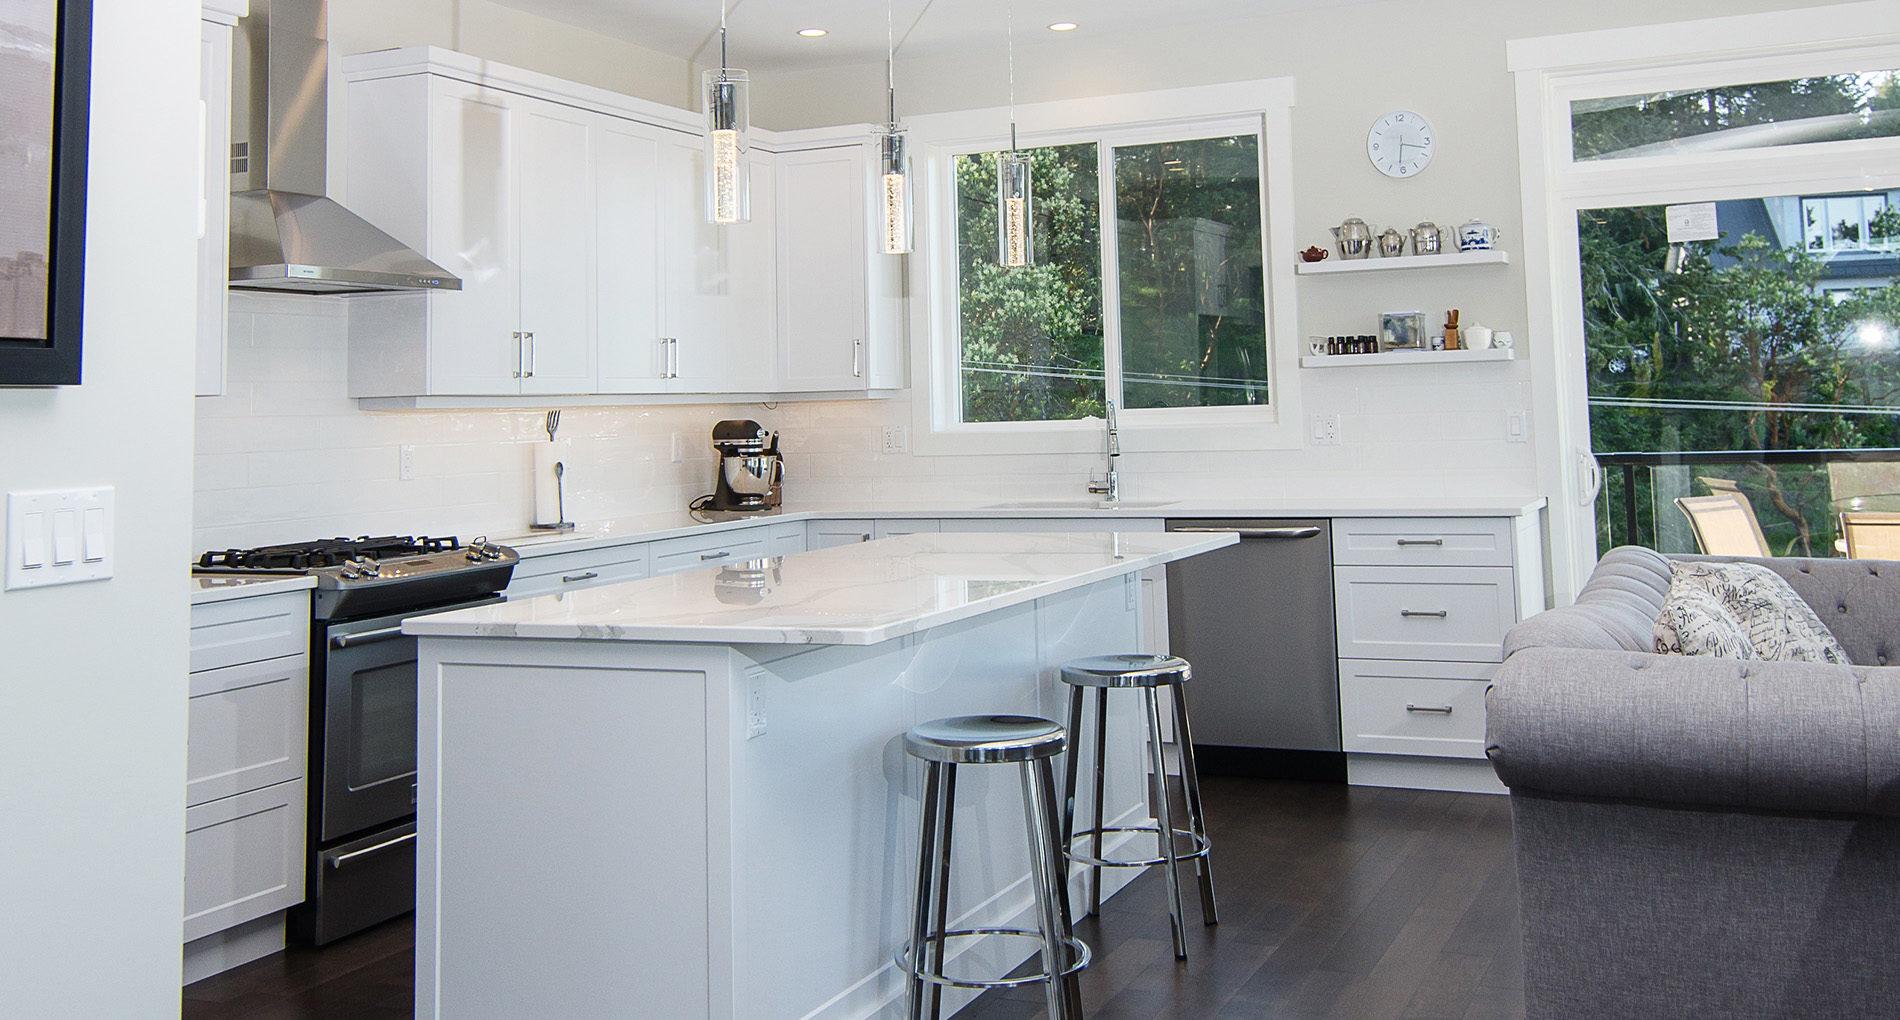 Kitchen Renovation Victoria Demel Slider